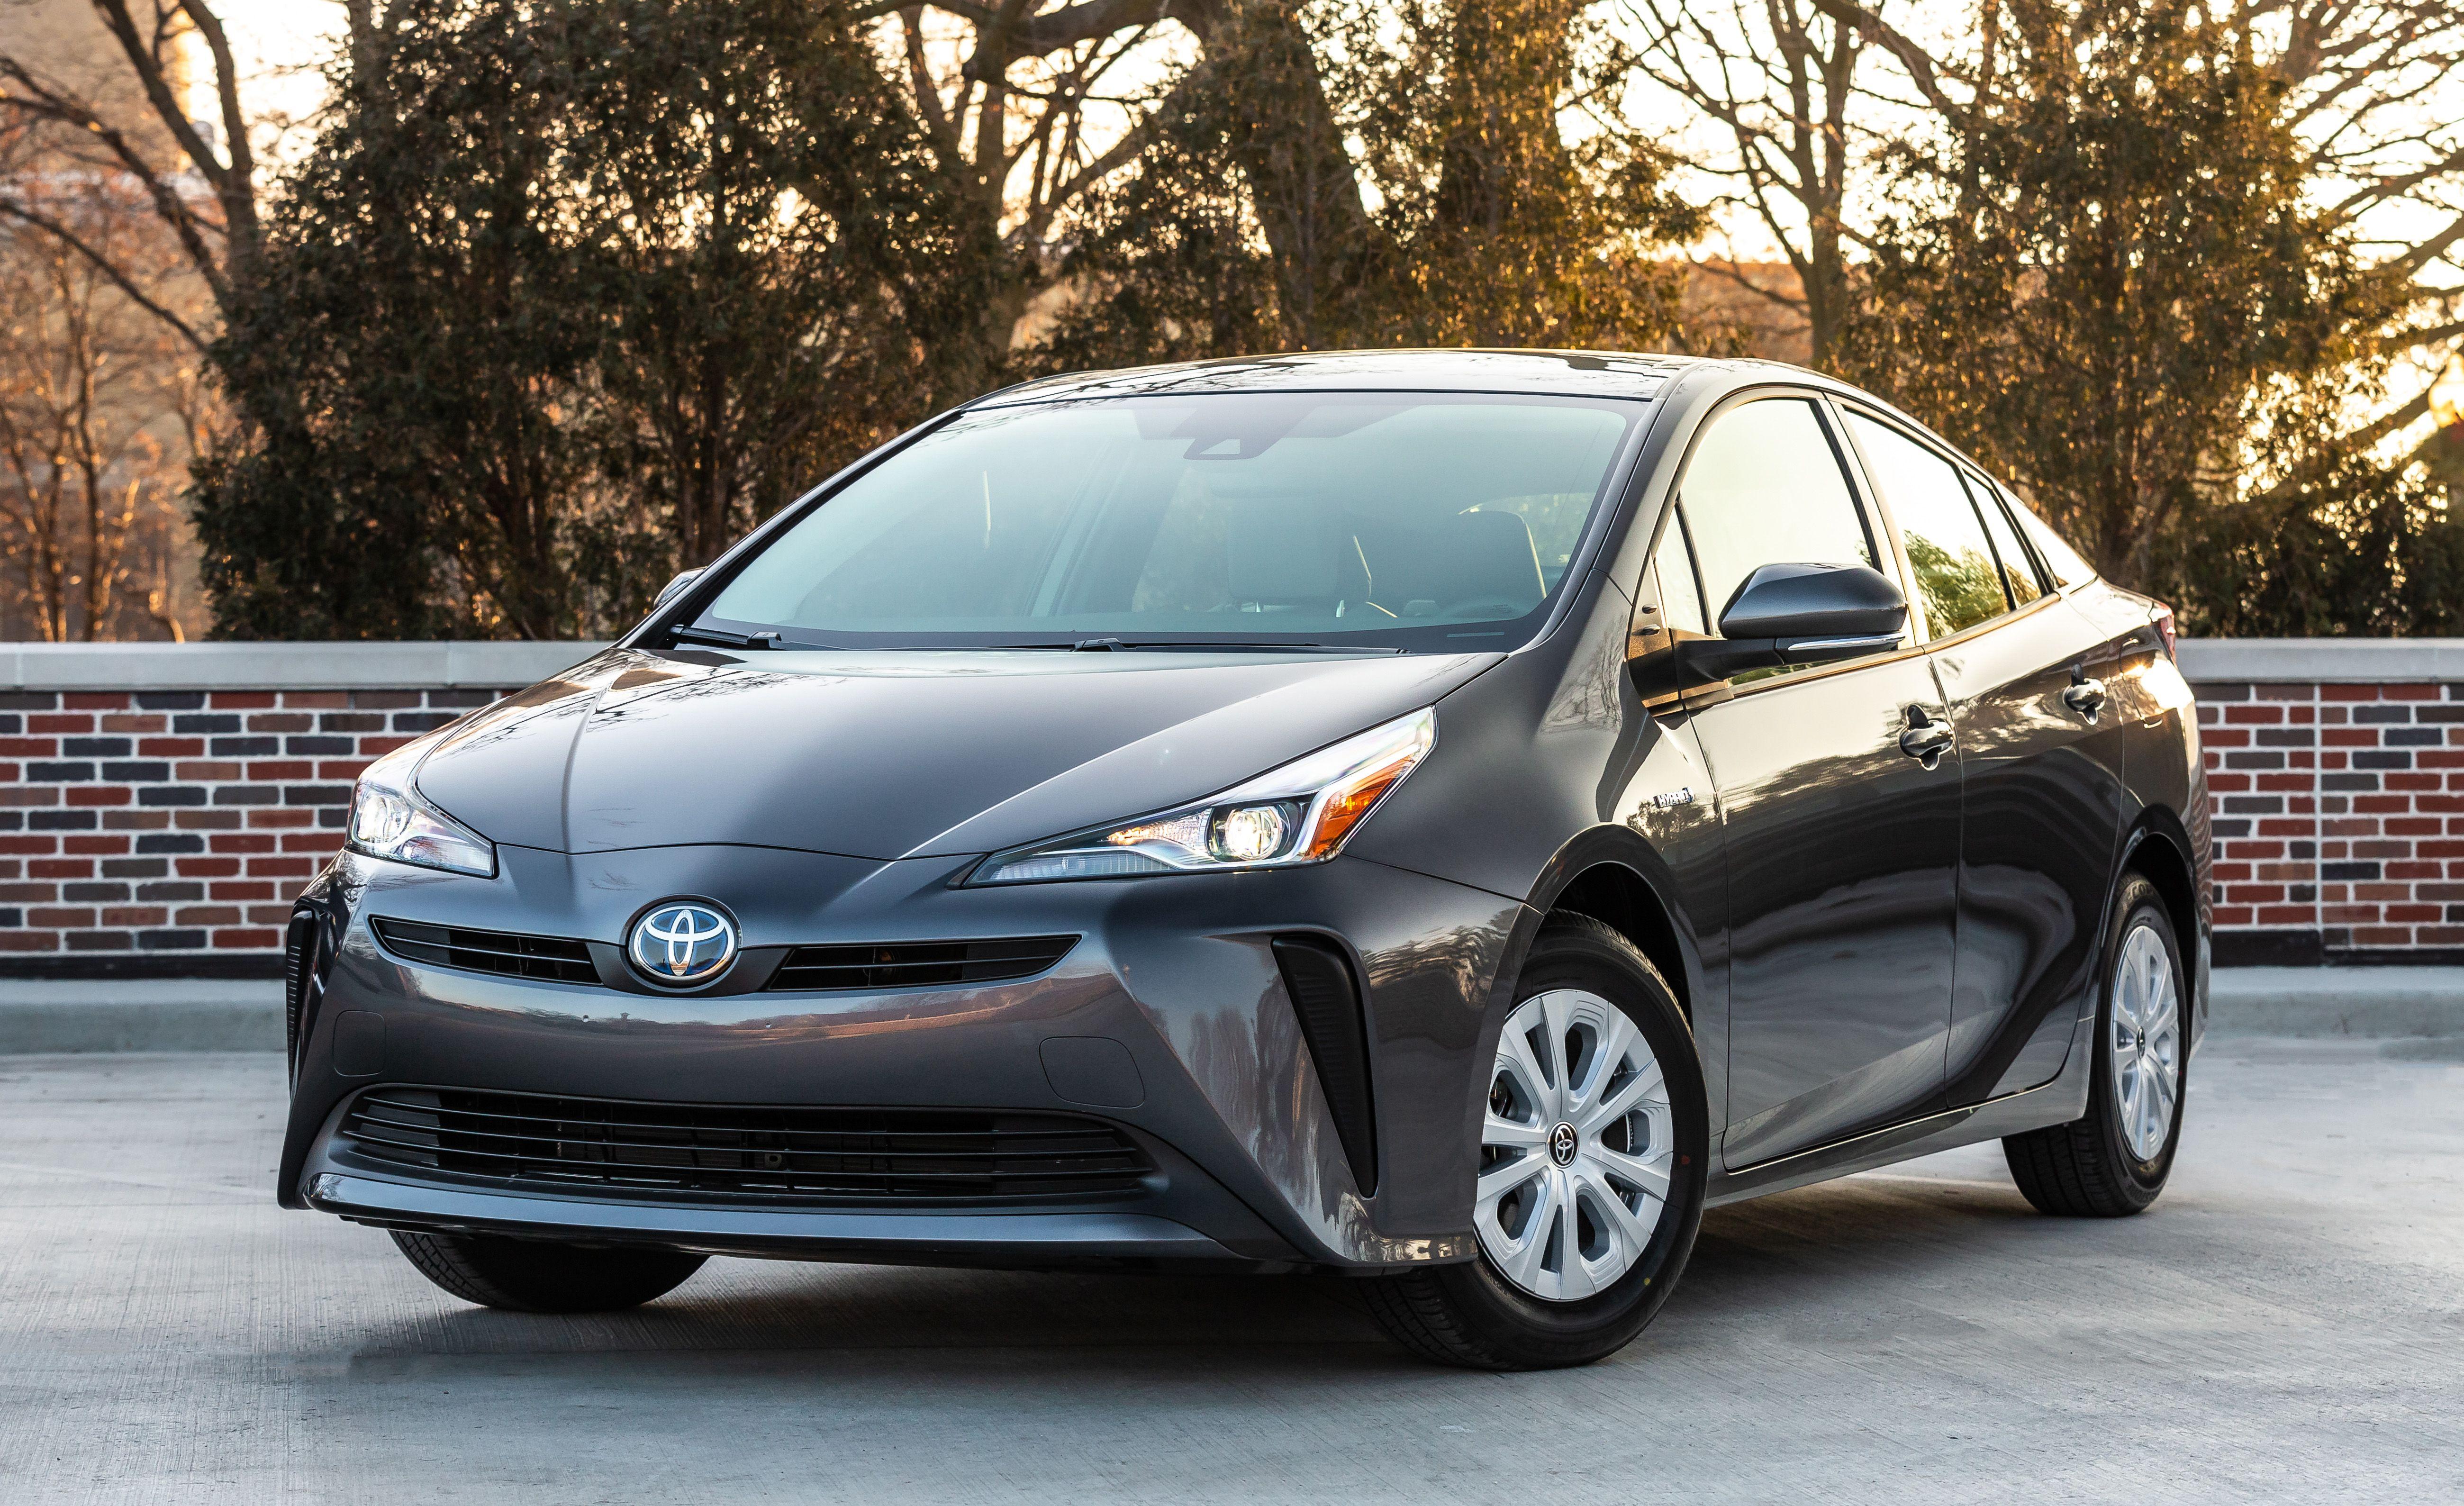 2019 Toyota Prius L-Eco